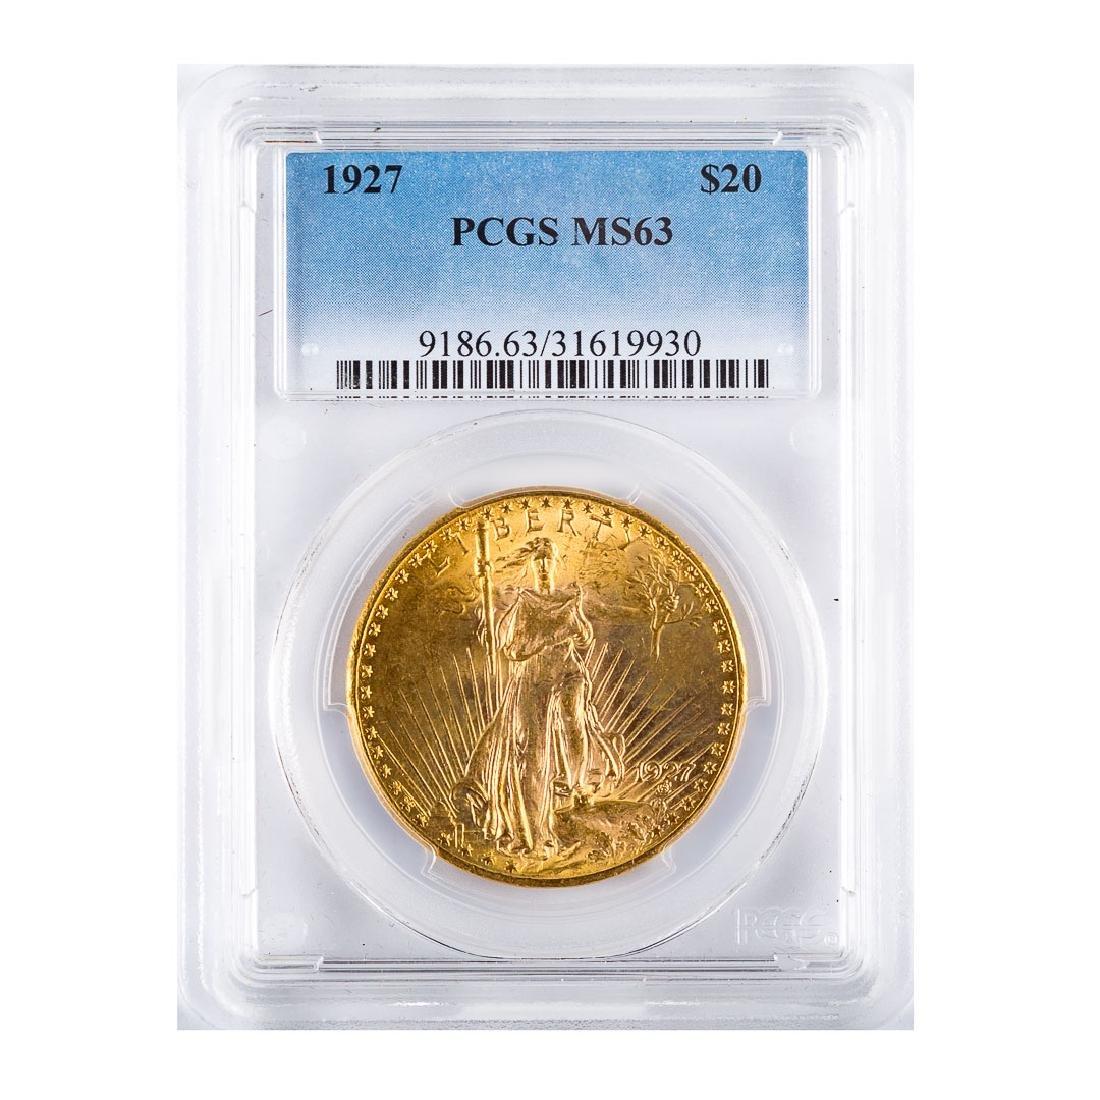 [US] 1927 $20 St.. Gaudens PCGS MS63